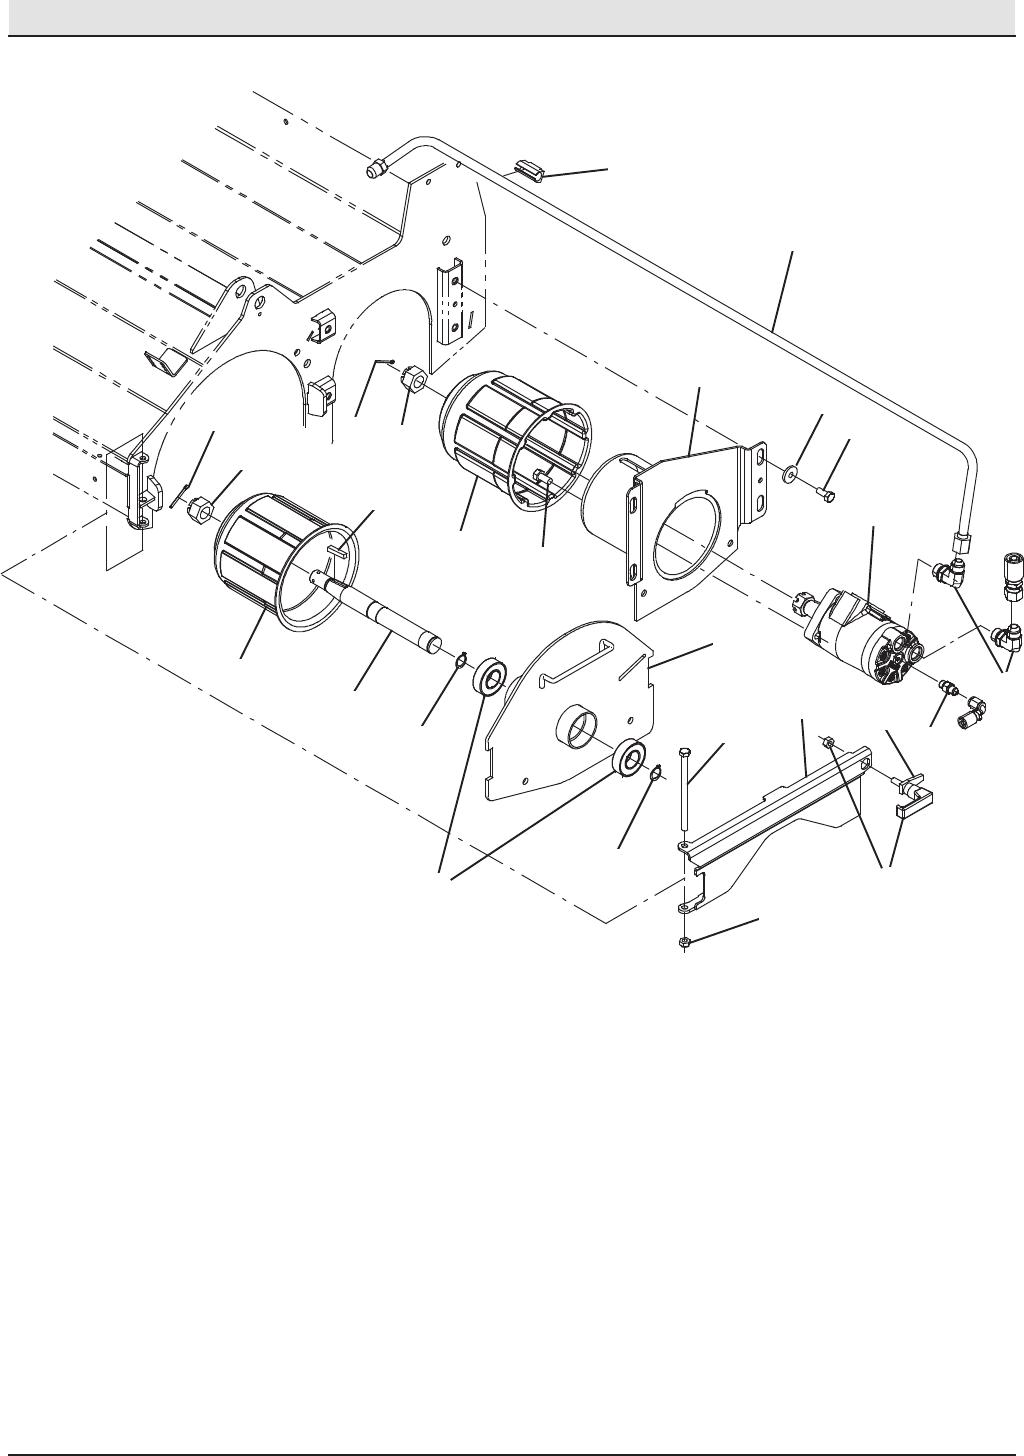 pyle pldnv695 wiring diagrams wiring diagram  pyle pldnv695 diagrams 1 9 woodmarquetry de u2022pldnv695 wiring diagram wiring diagram rh 33 sbaphotography